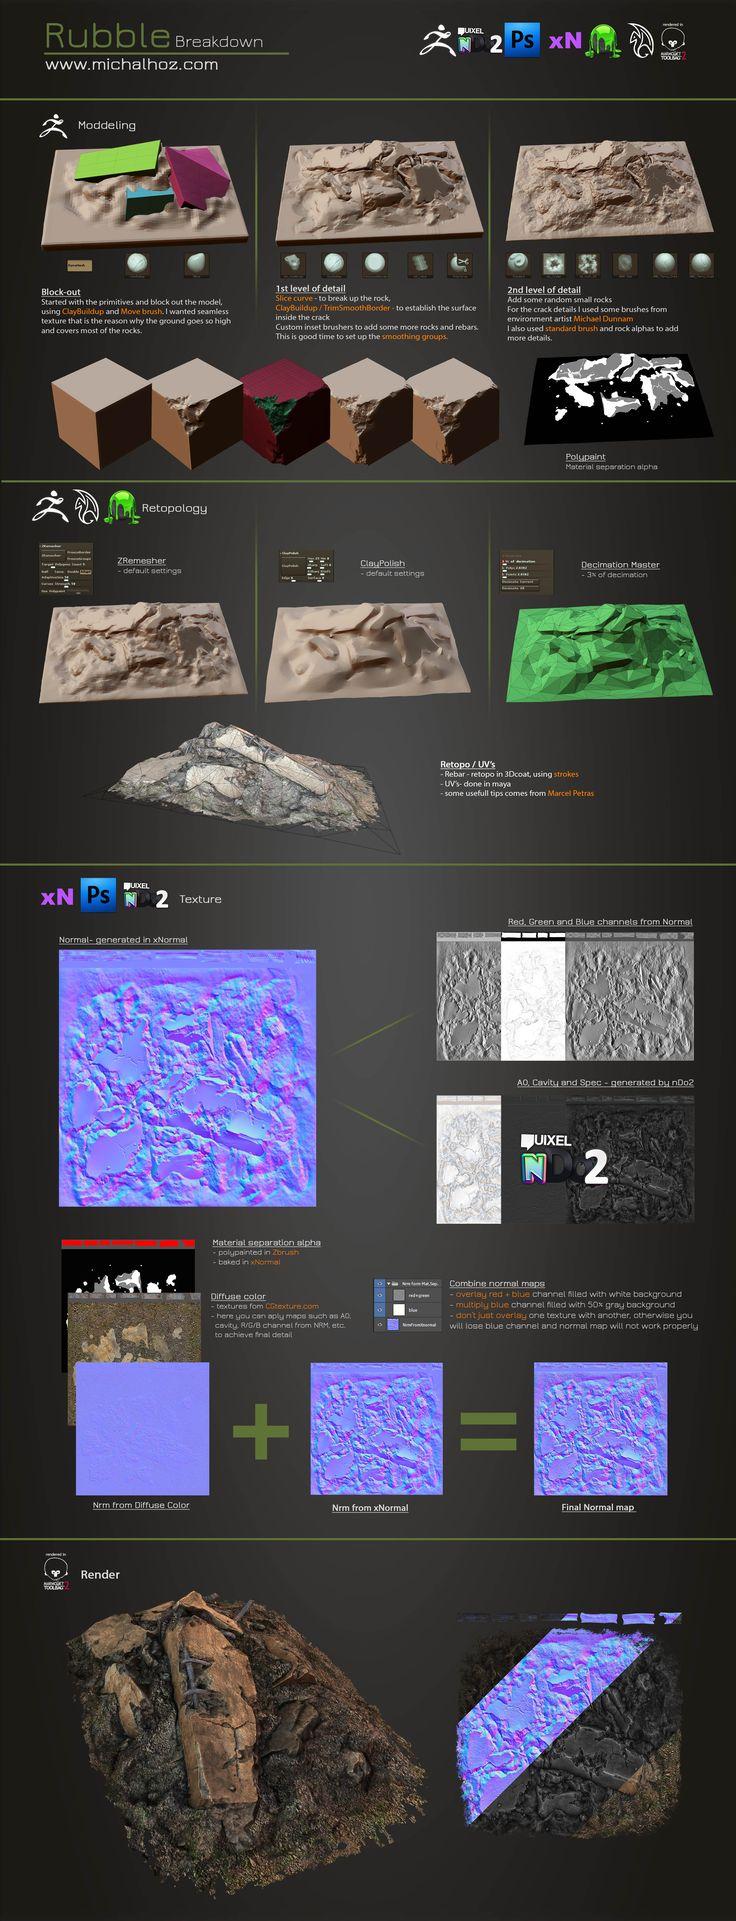 mh_rubblebreakdown_by_michalhoz-d79s4iy.jpg (2500×6527)